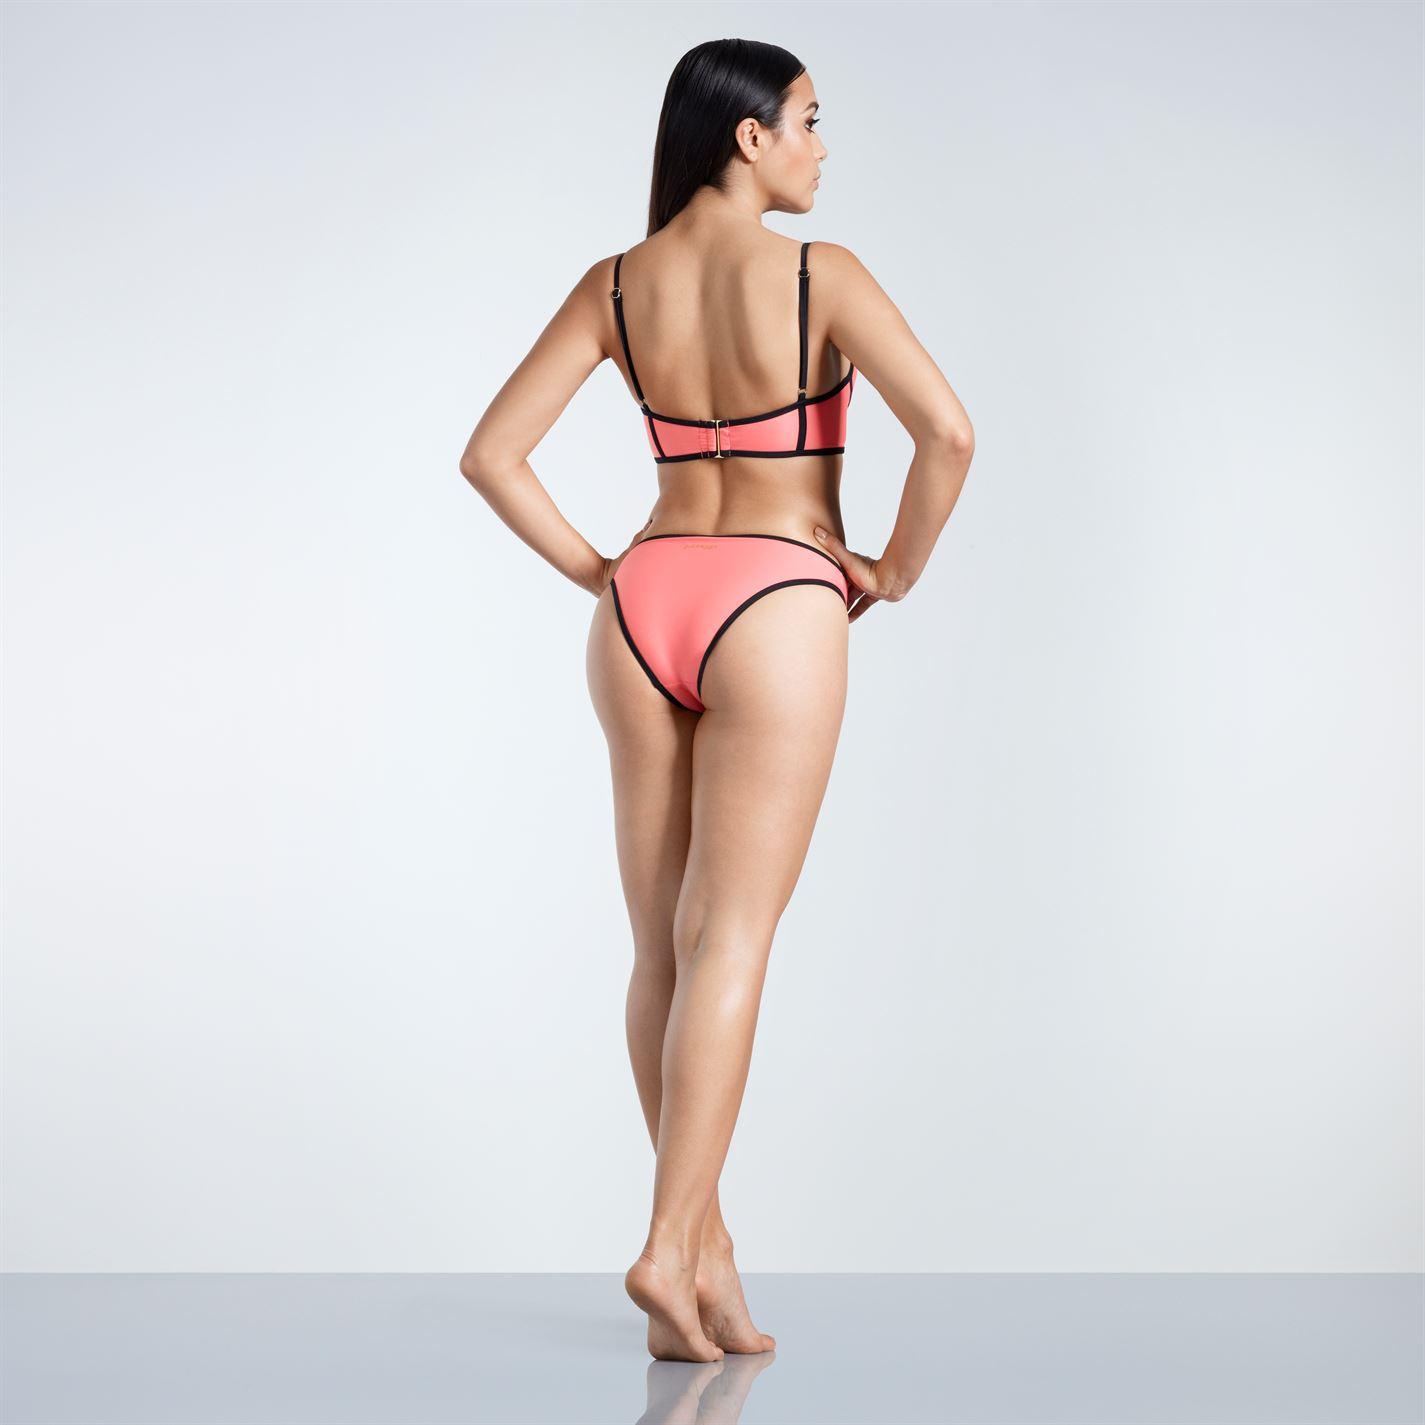 ae3c00ccda Golddigga Long Line Bikini Bottoms Ladies Briefs Stretch Colour ...